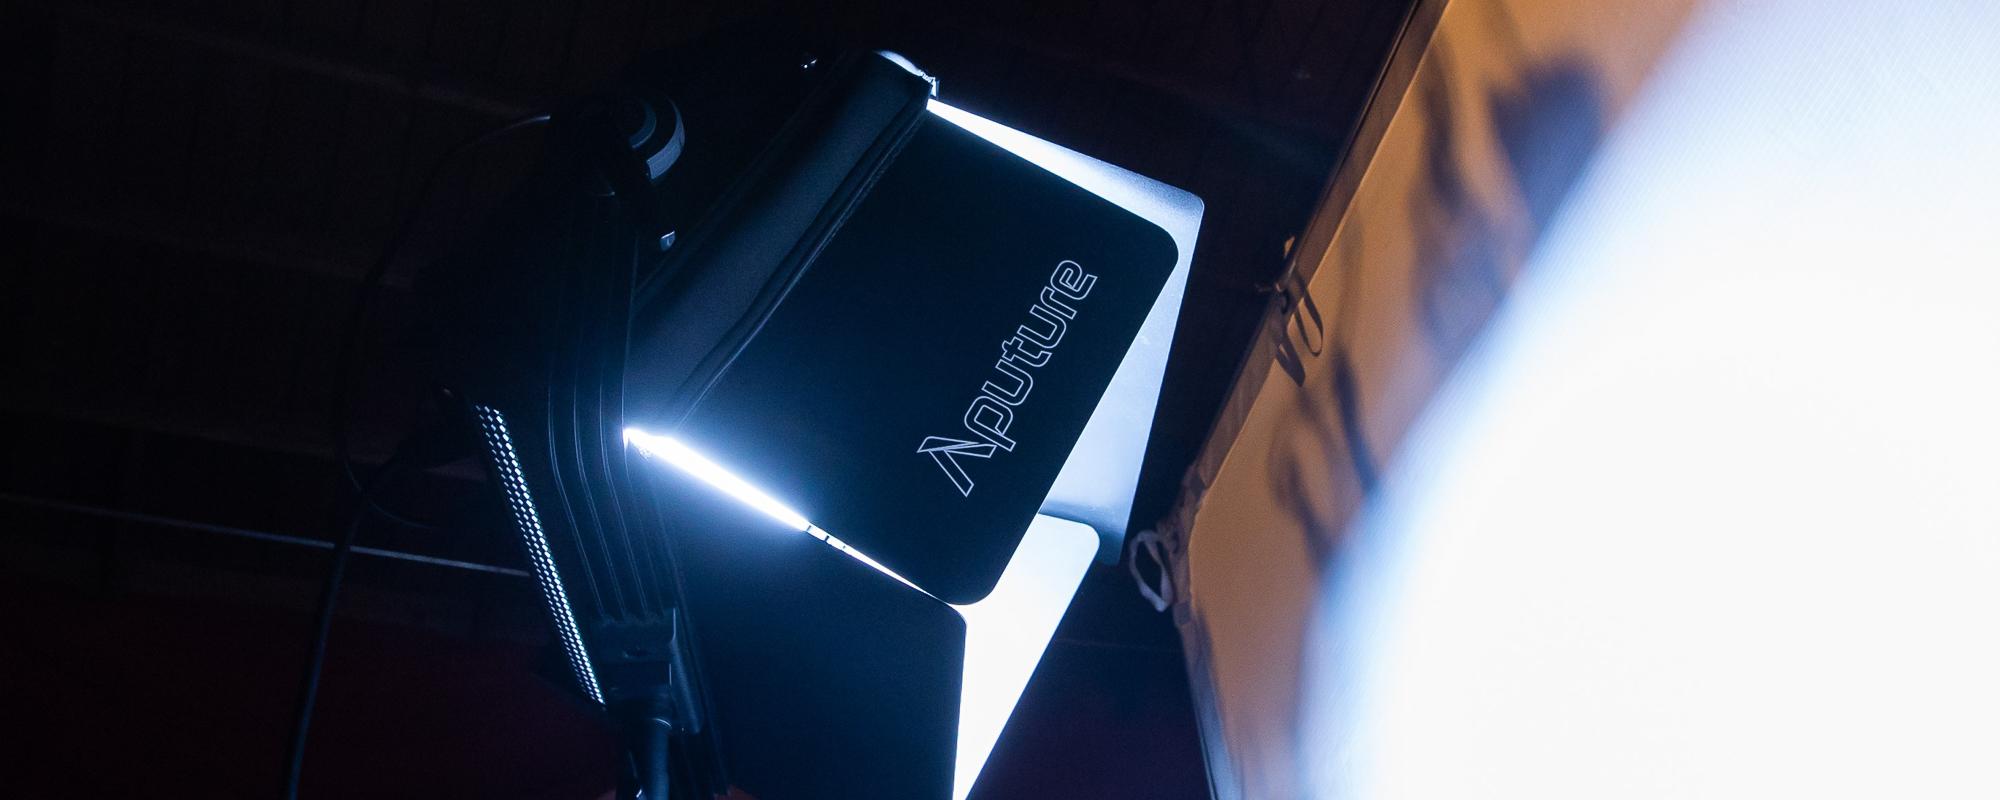 Wrota Aputure Nova Barn Doors - szybki montaż na lampie